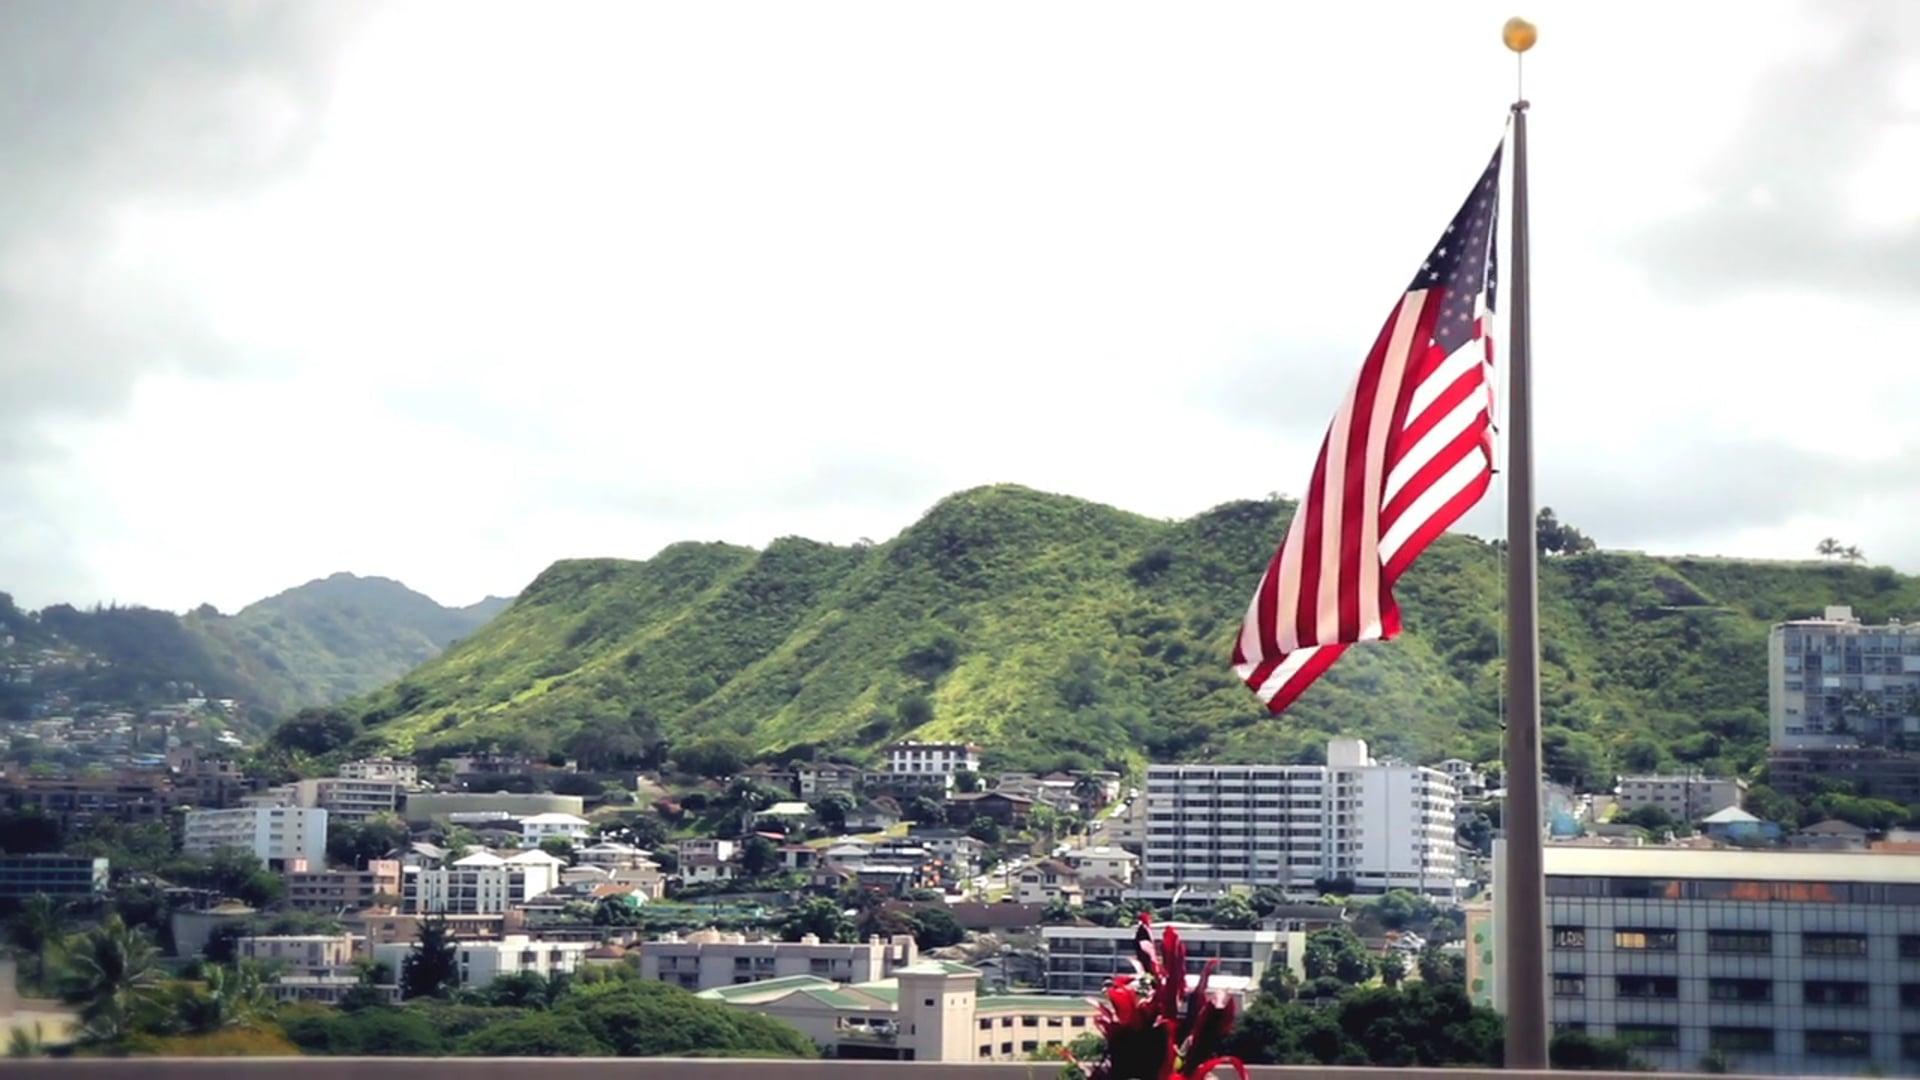 CIVIL BEAT \\ HAWAII'S WATCHDOGS